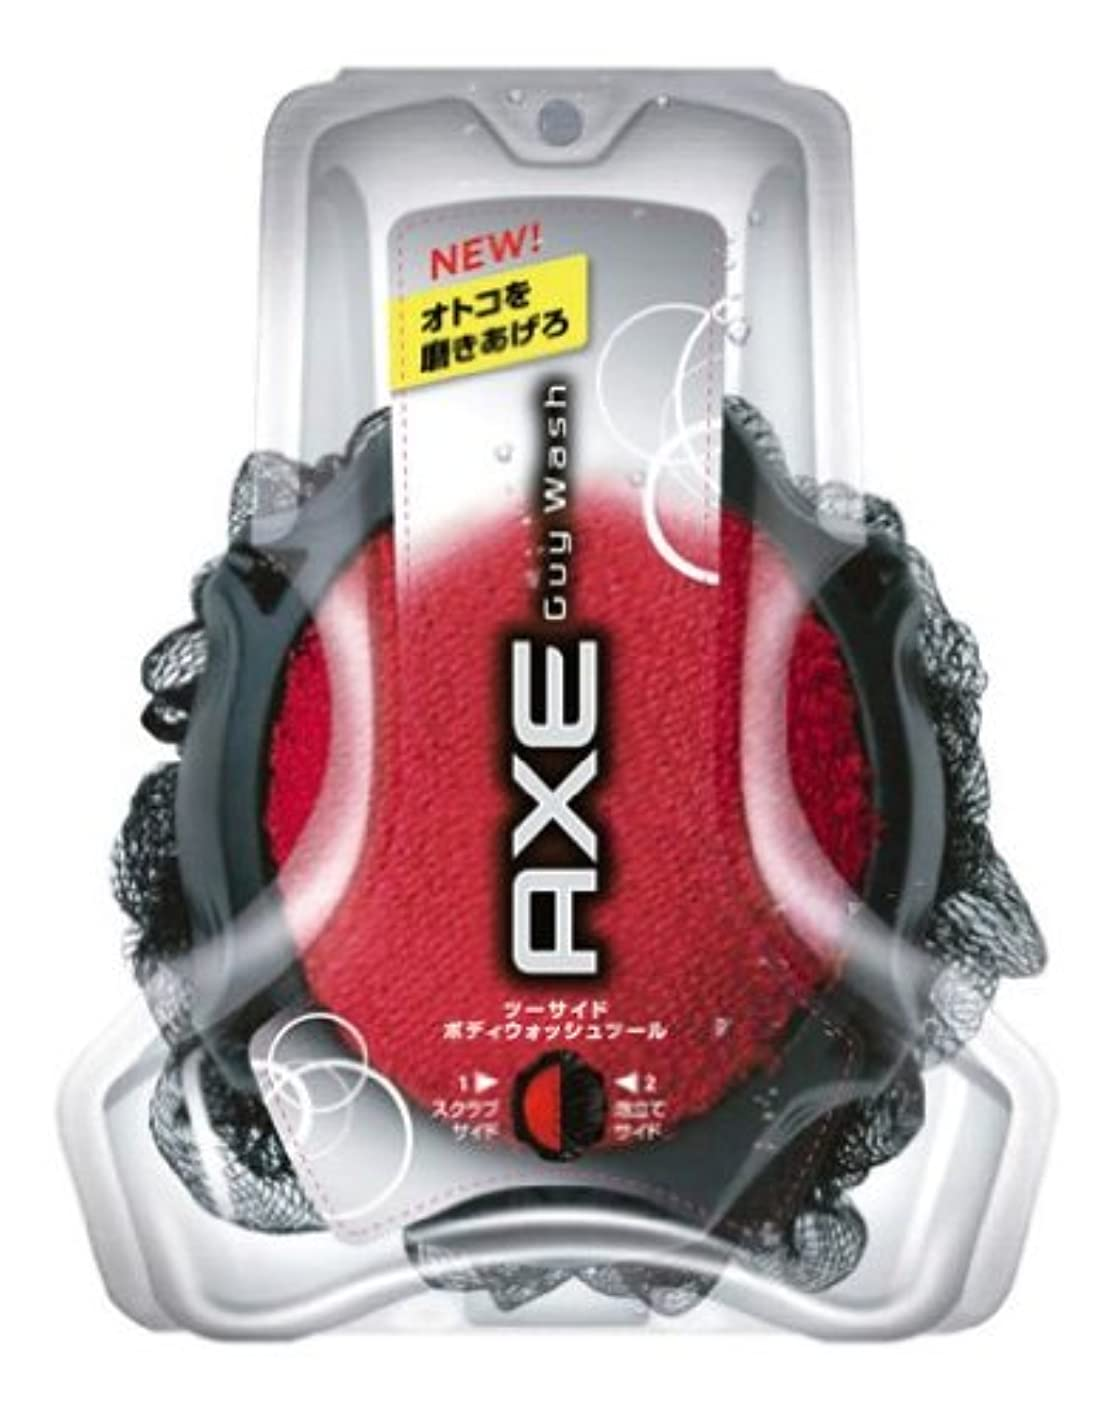 AXE(アックス) ガイウォッシュ 88g